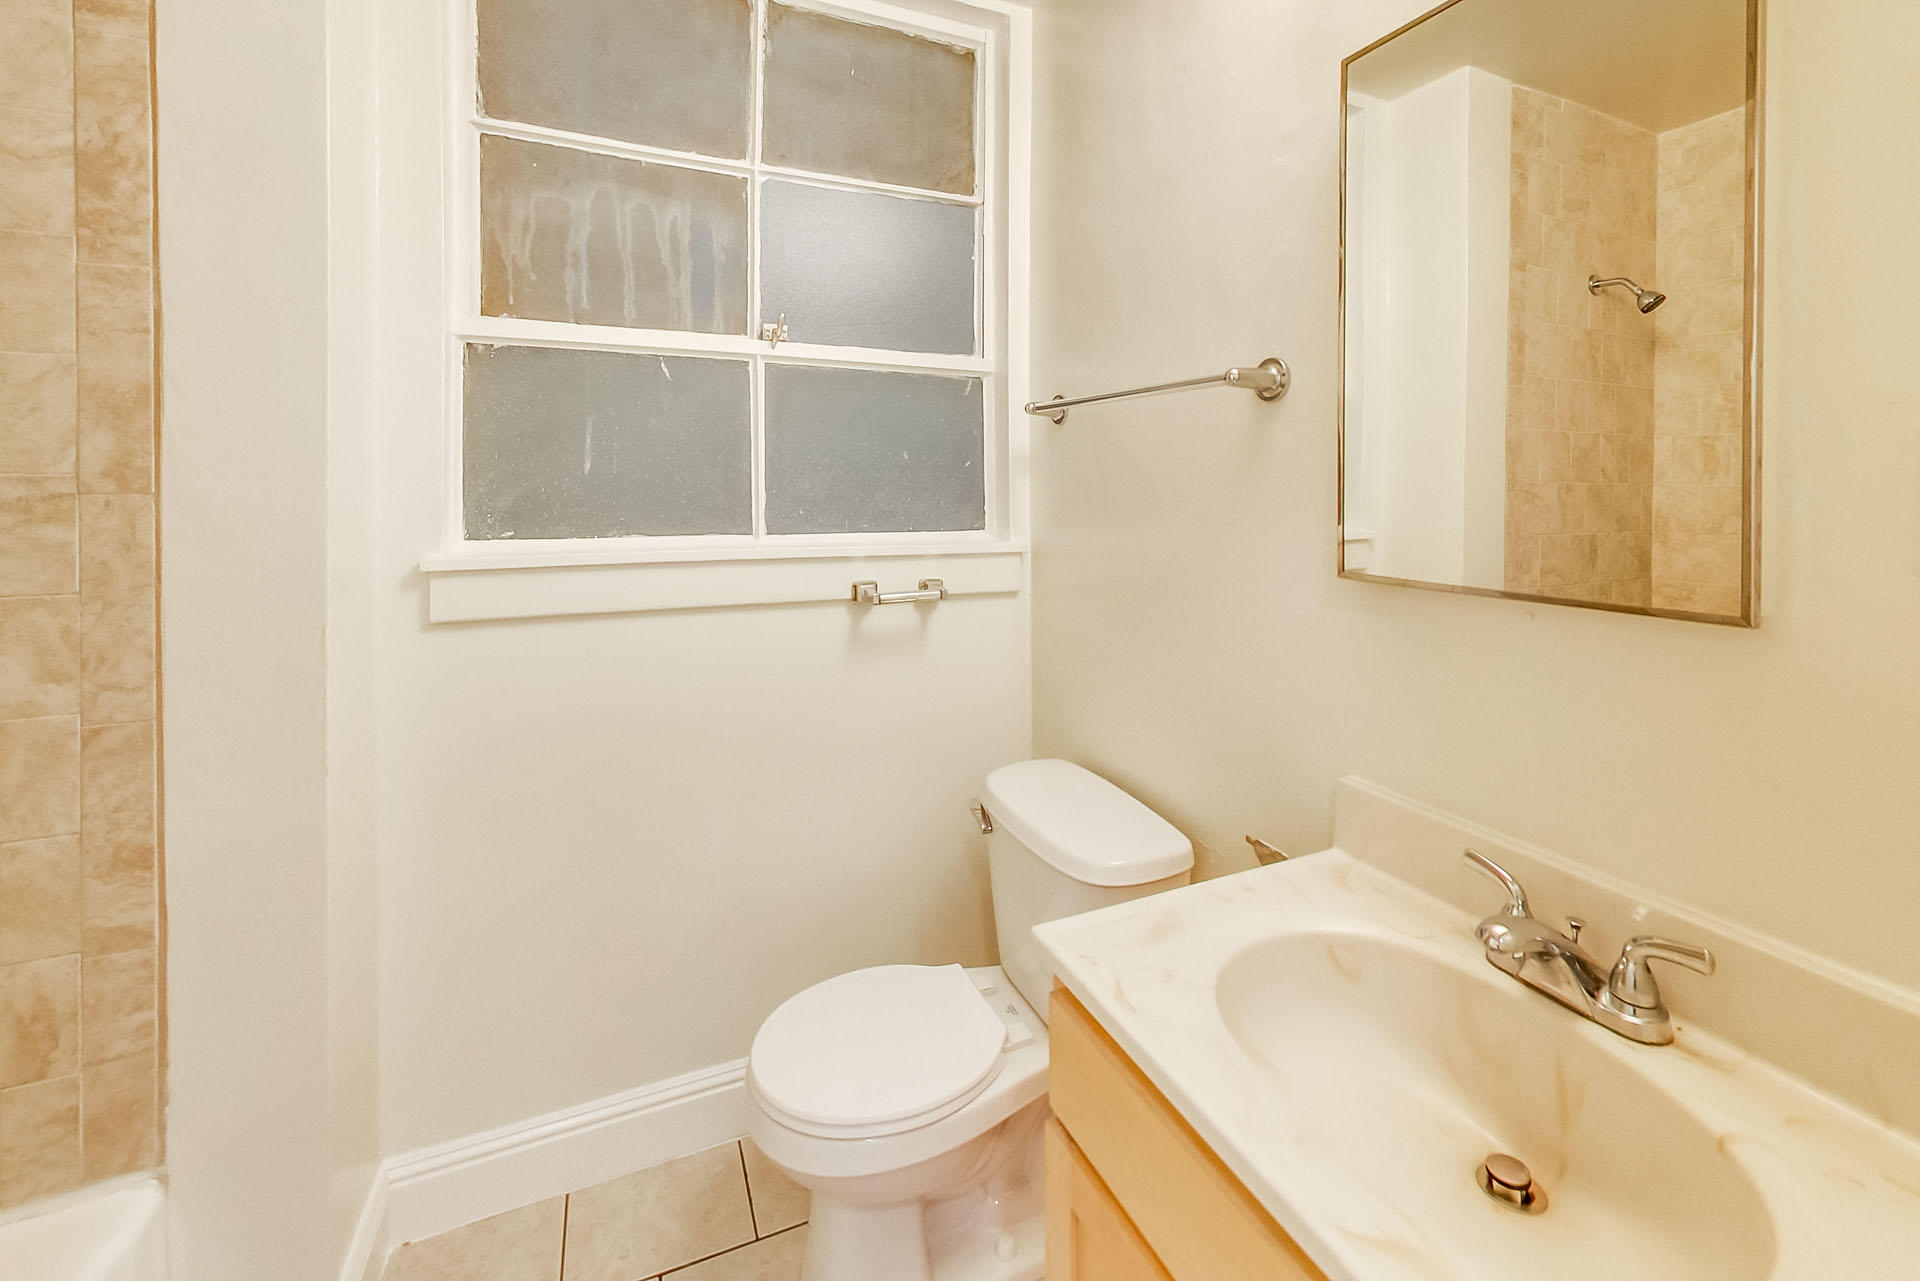 784 Geary St, San Francisco, CA 94109 - 1 Bed, 1 Bath - 18